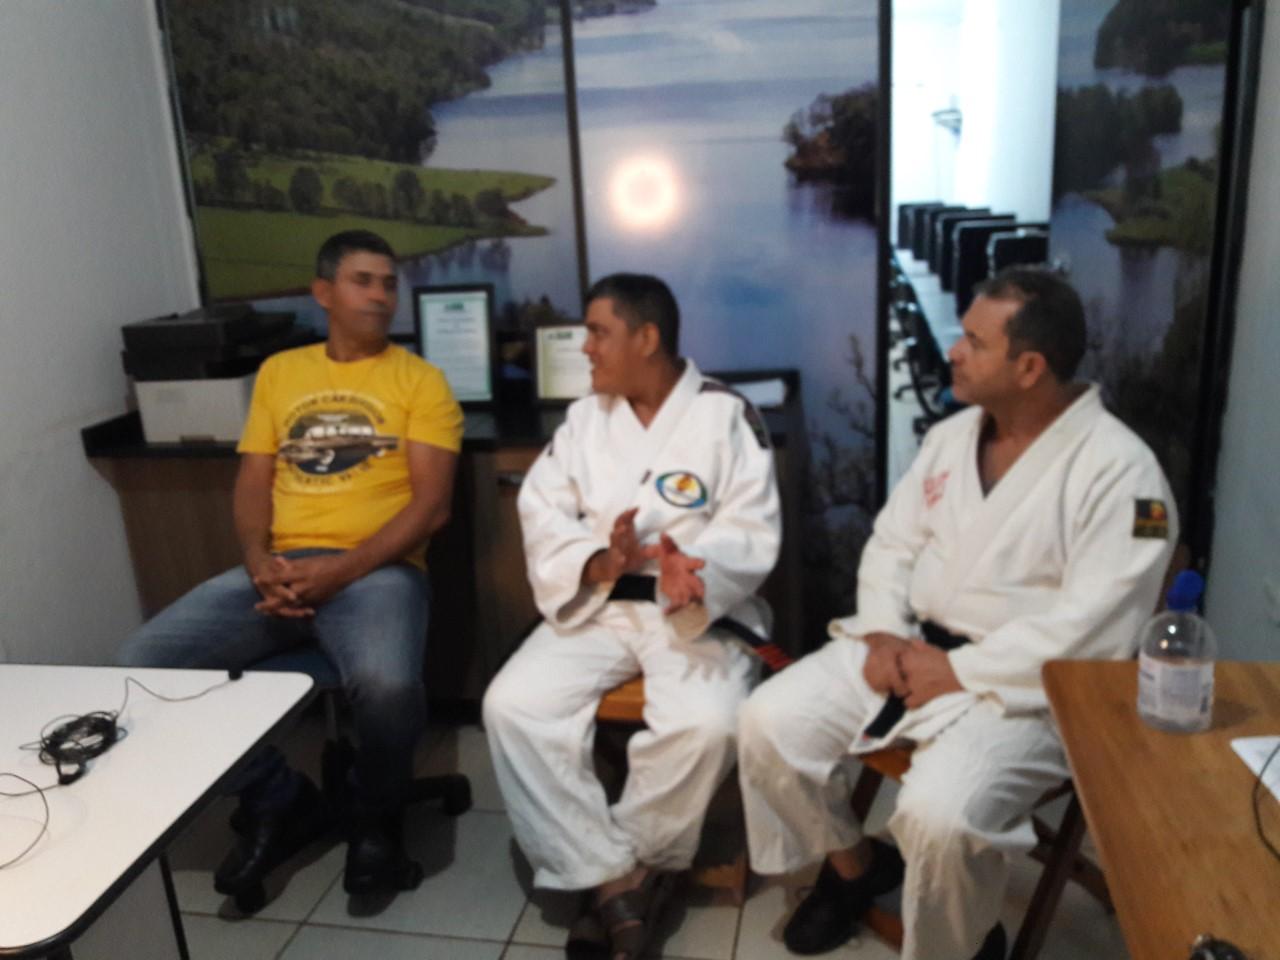 Maracaju: Projeto Viva Vida e LCJMS firmam parceria